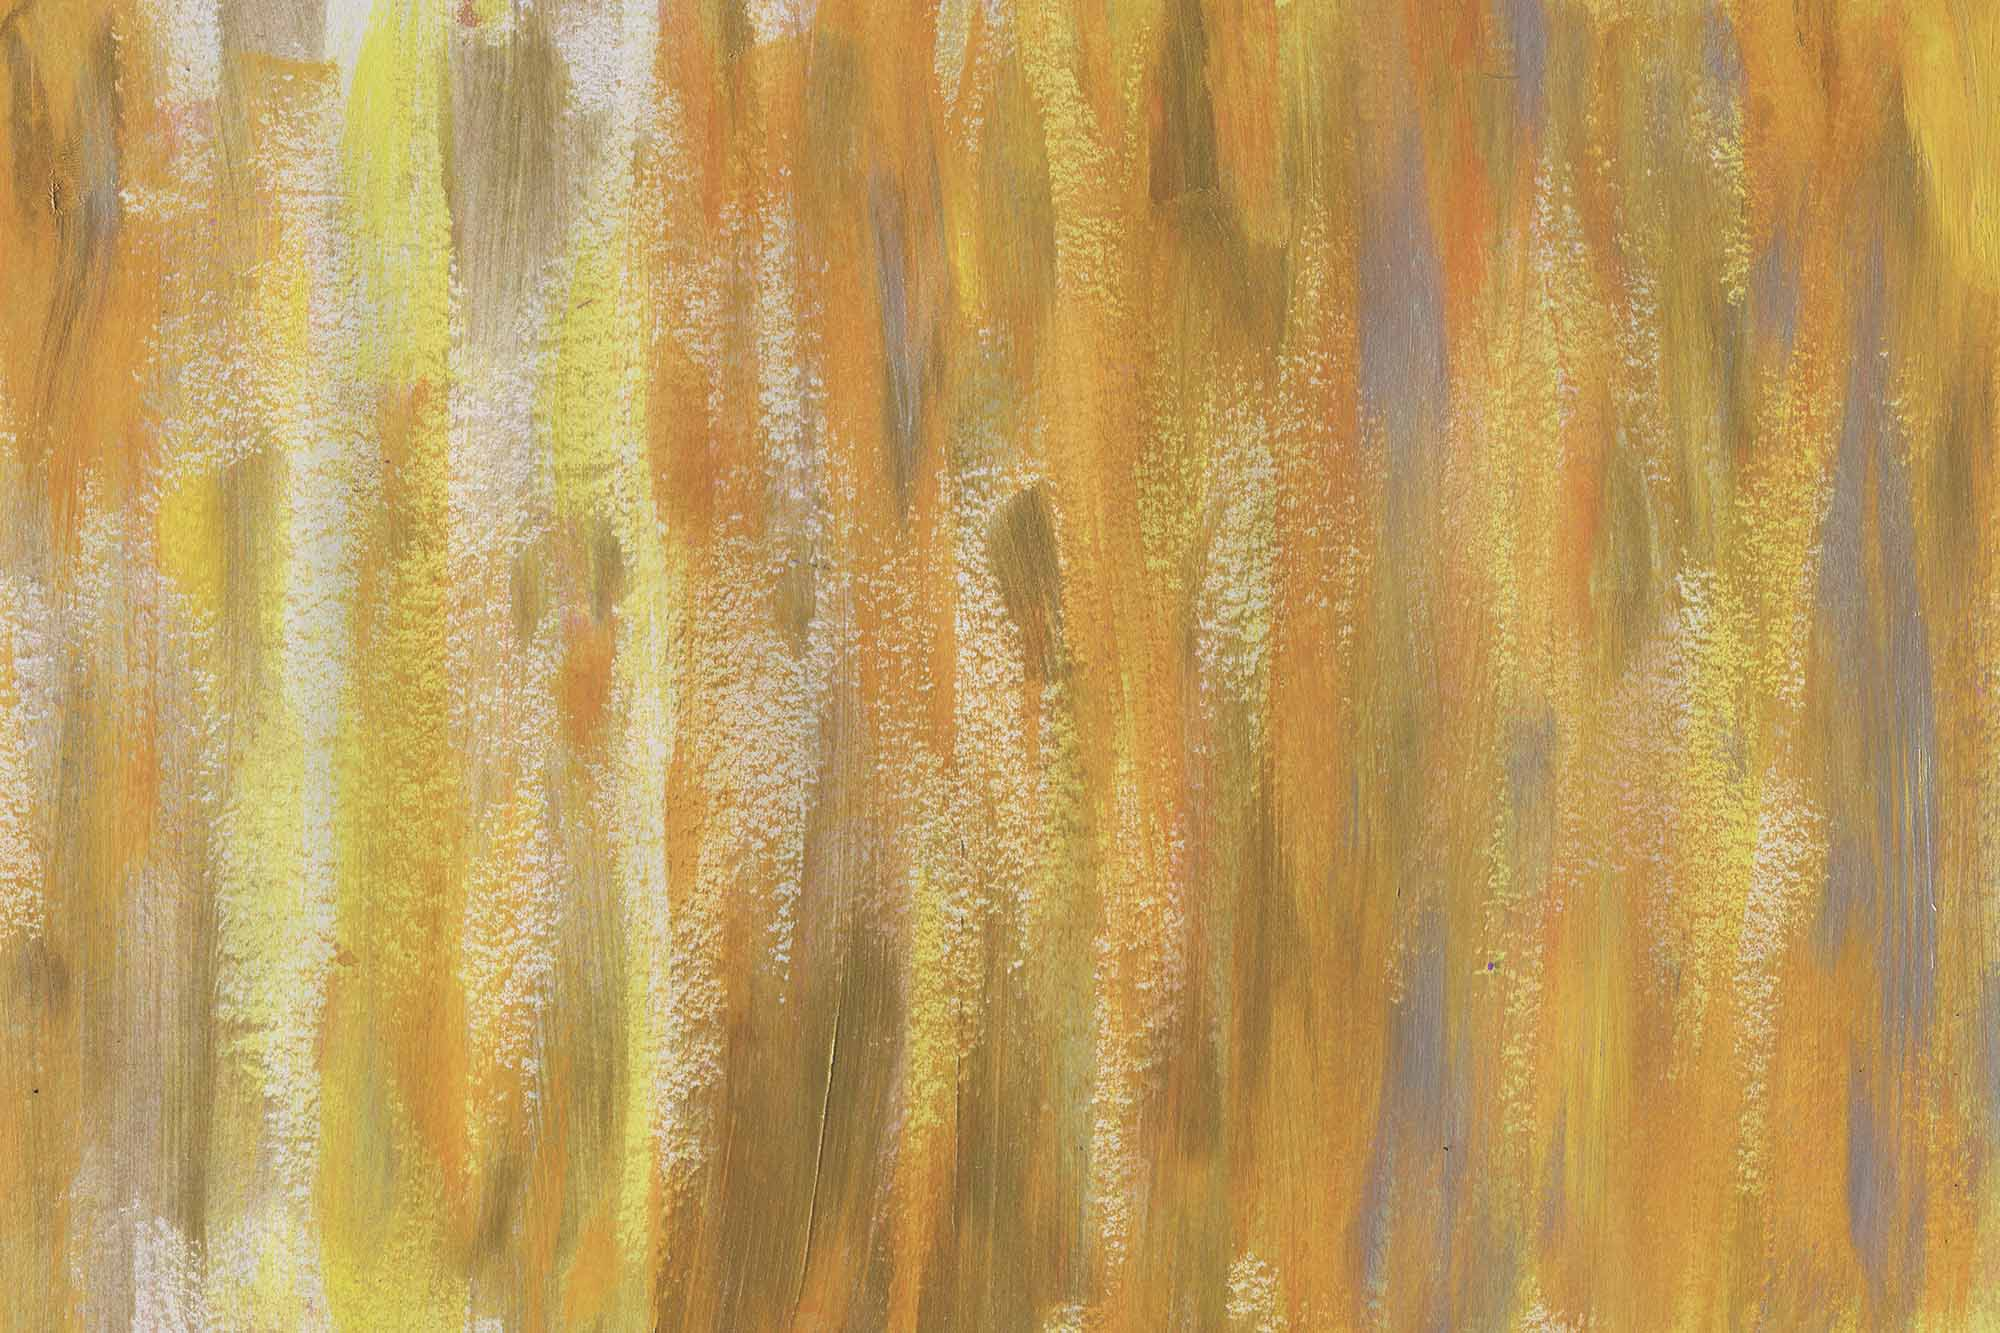 Modern Abstract Acrylic Textures 11